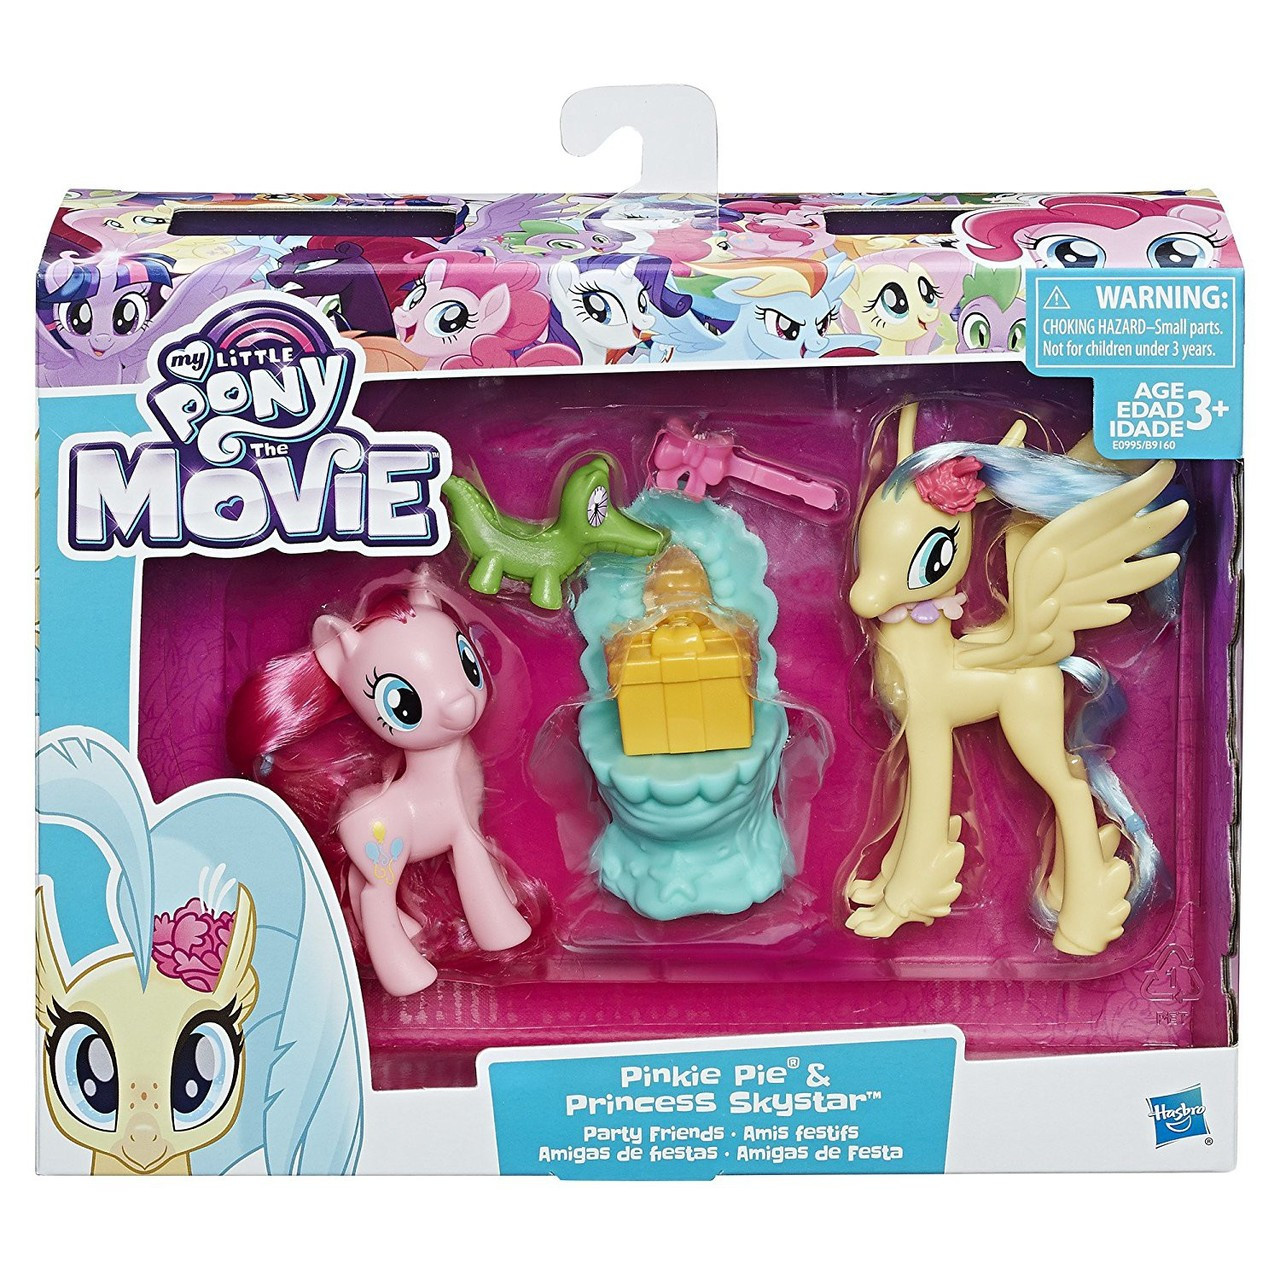 my little pony the movie pinkie pie princess skystar party friends